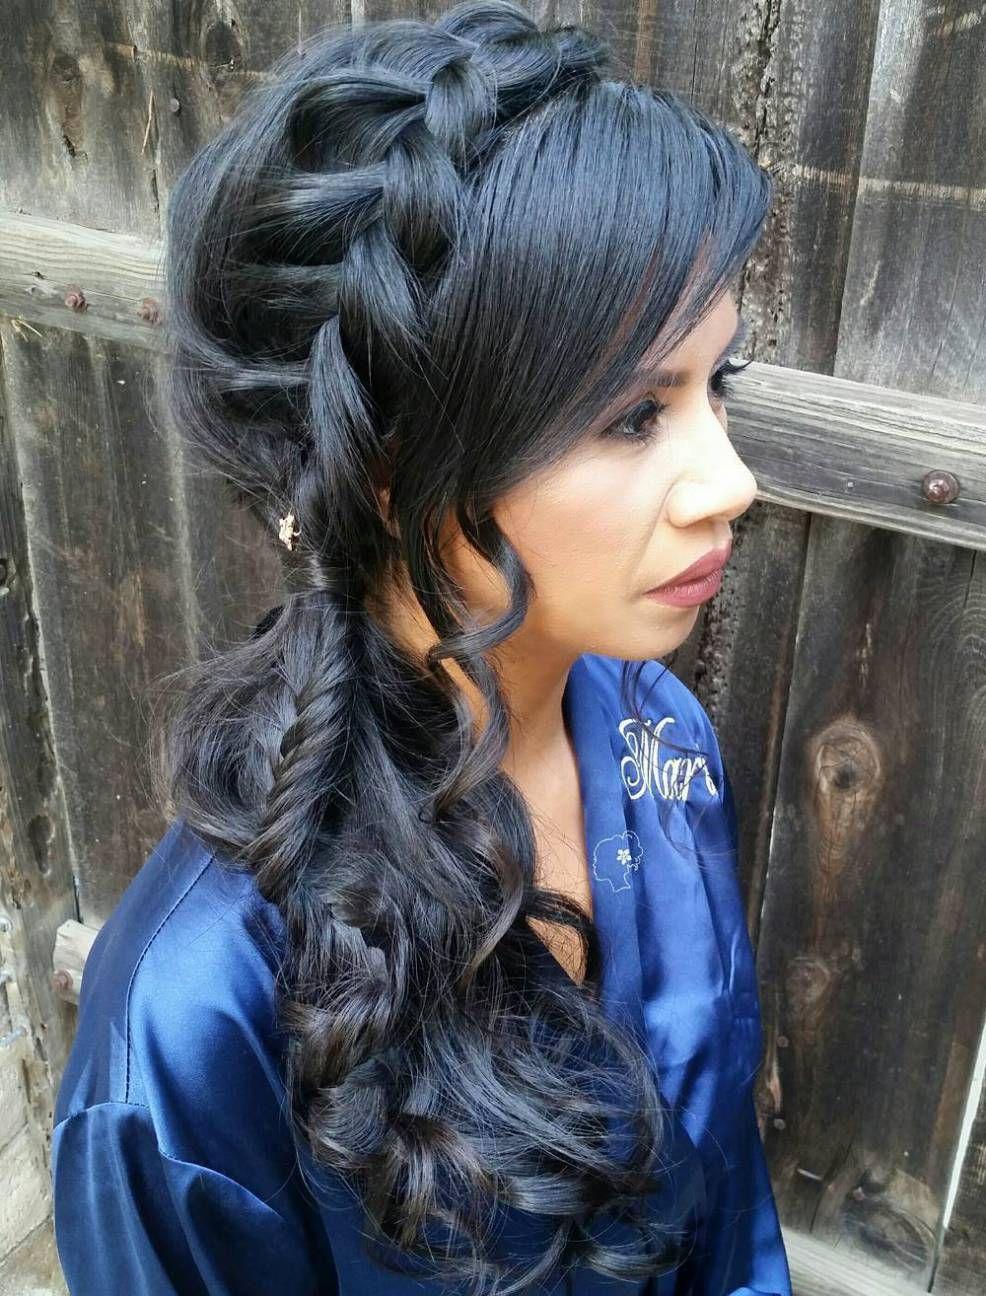 Braided ponytail ideas cute ponytails with braids braids